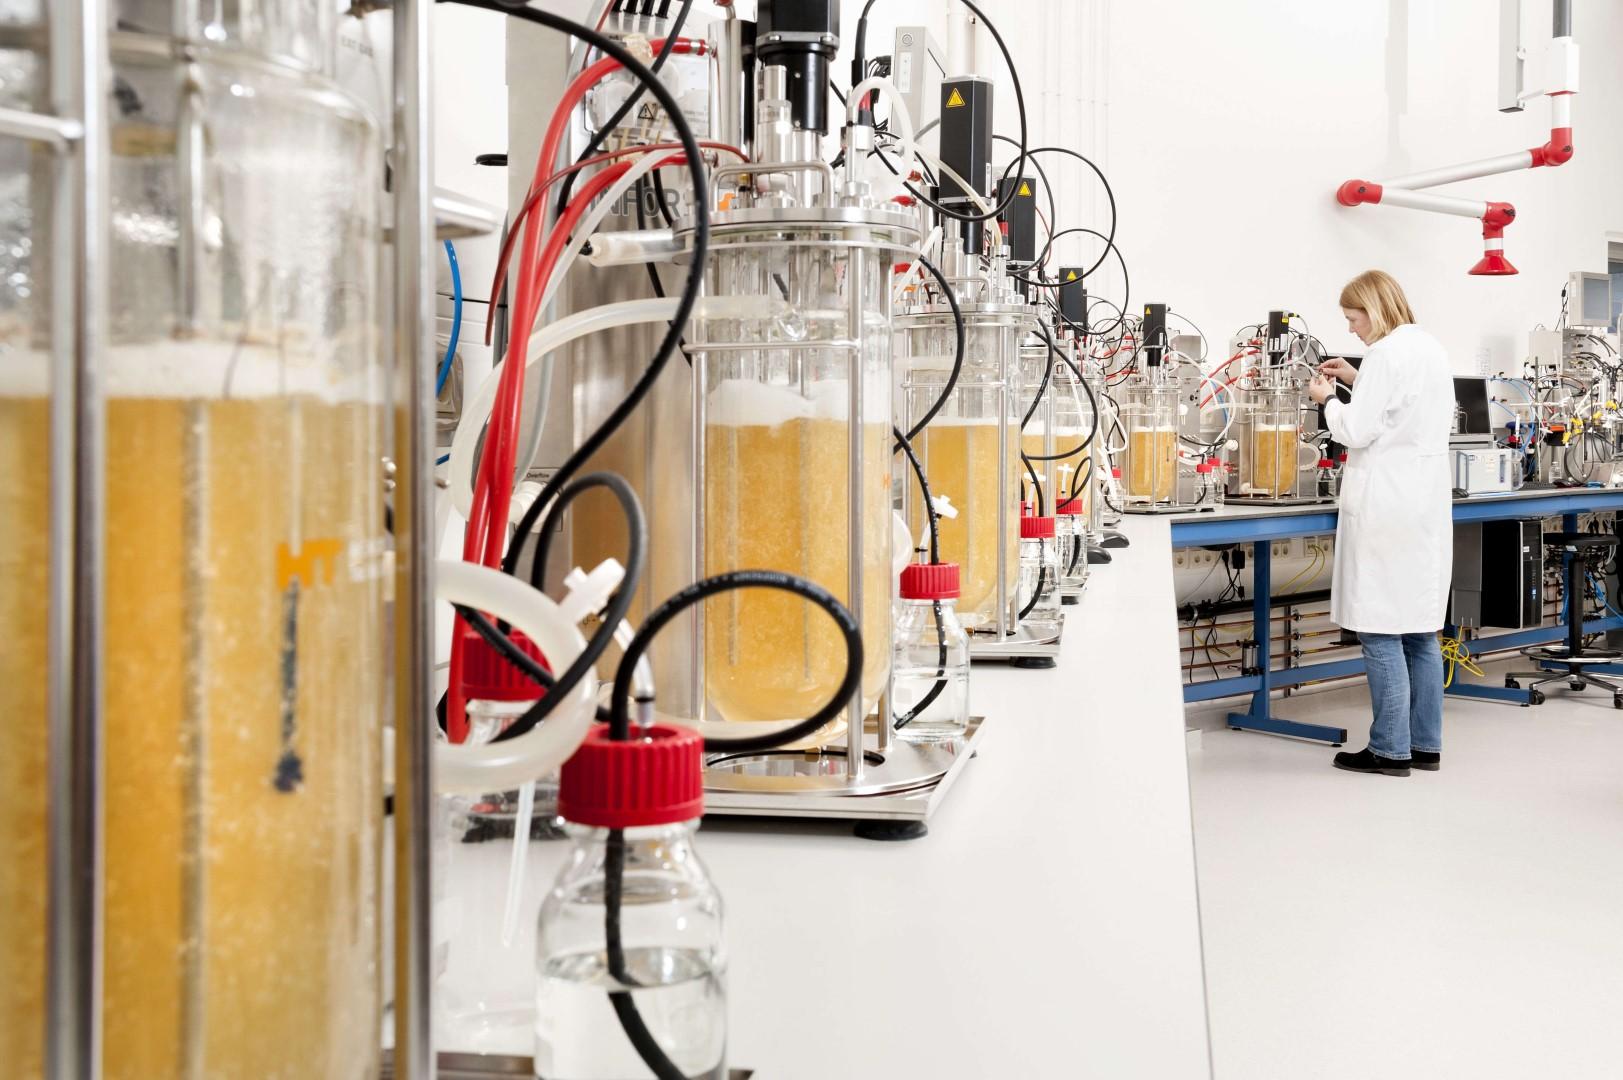 fermentorhal bio base europe pilot plant small (Large)